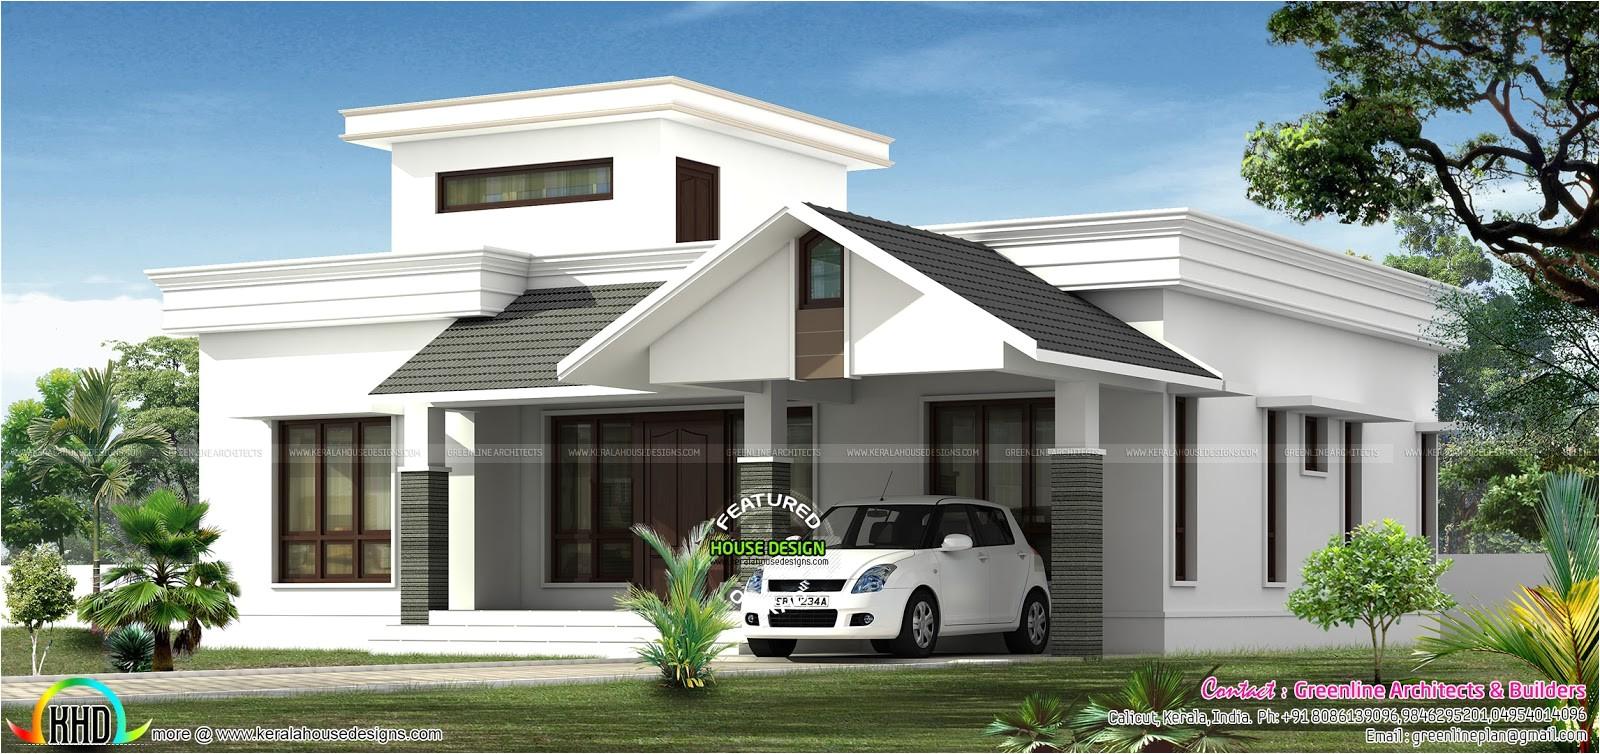 small budget house plans kerala